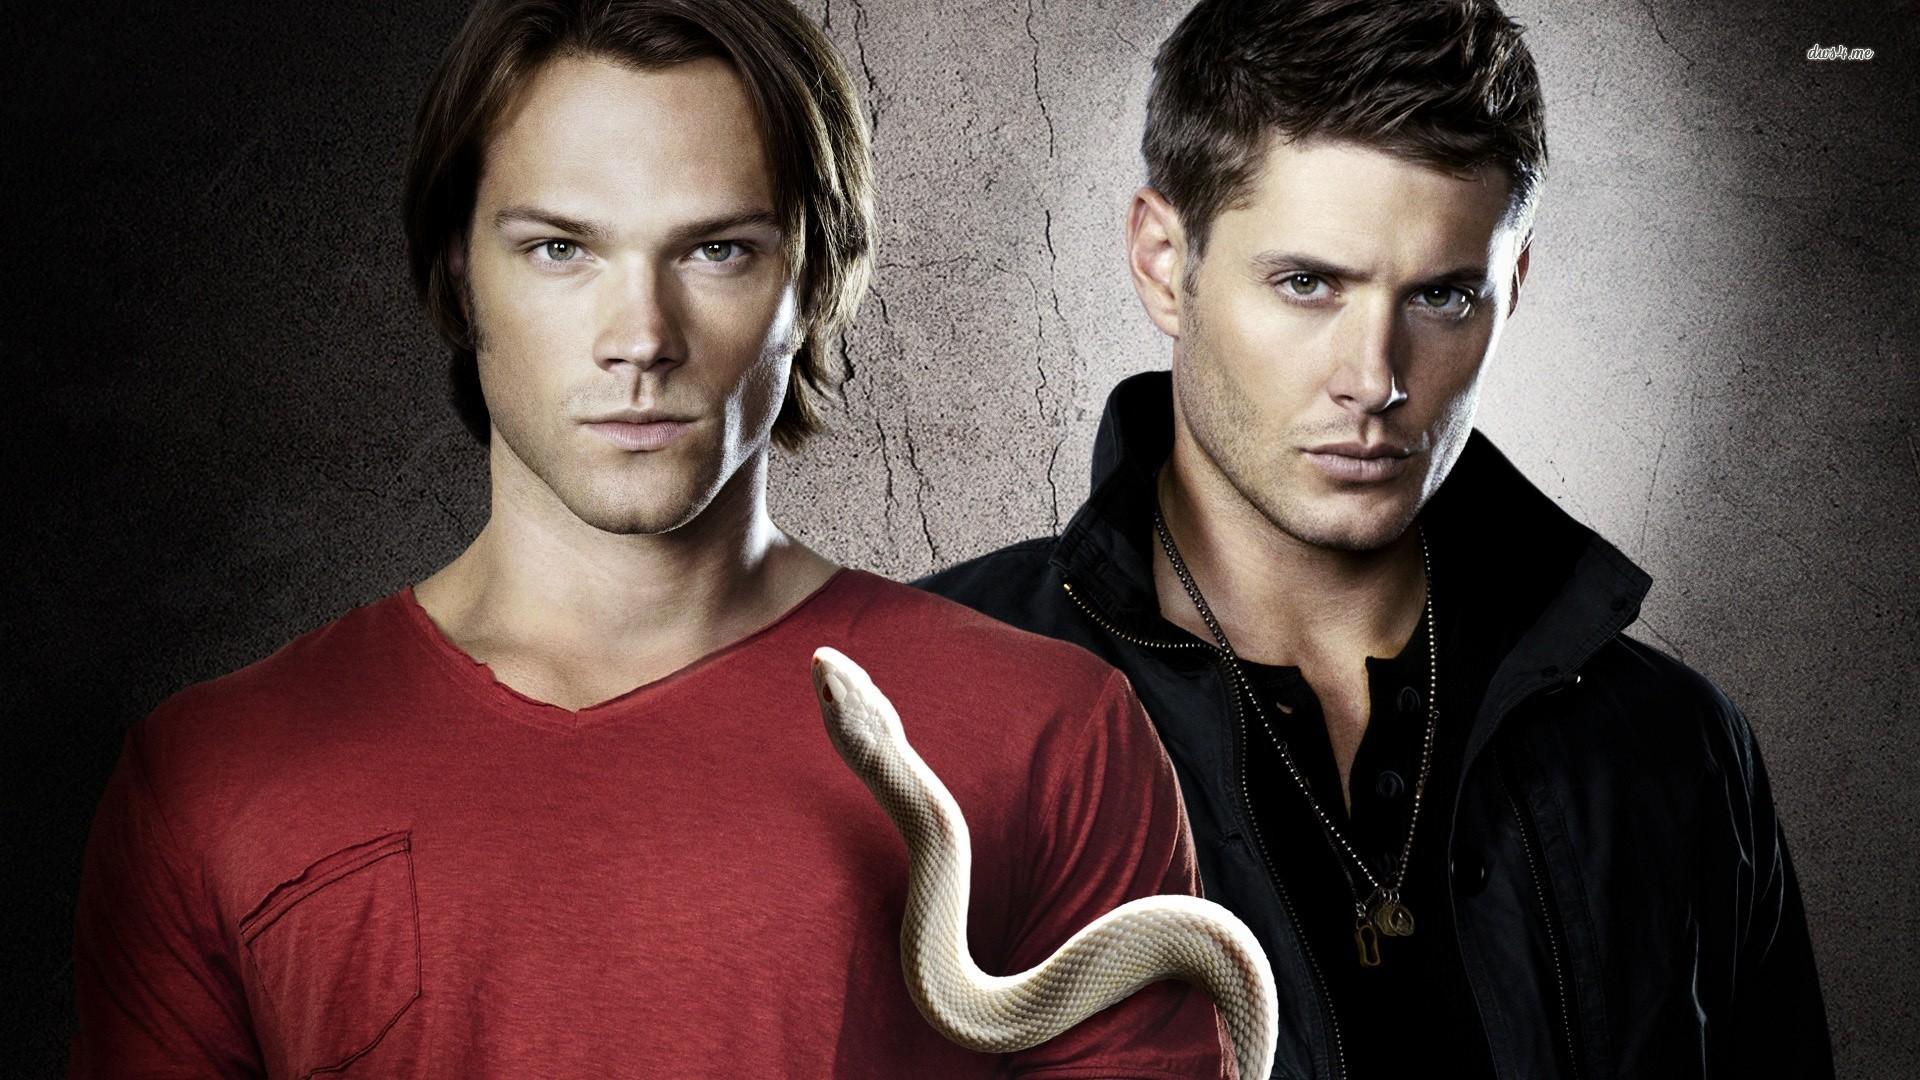 supernatural wallpapers snake